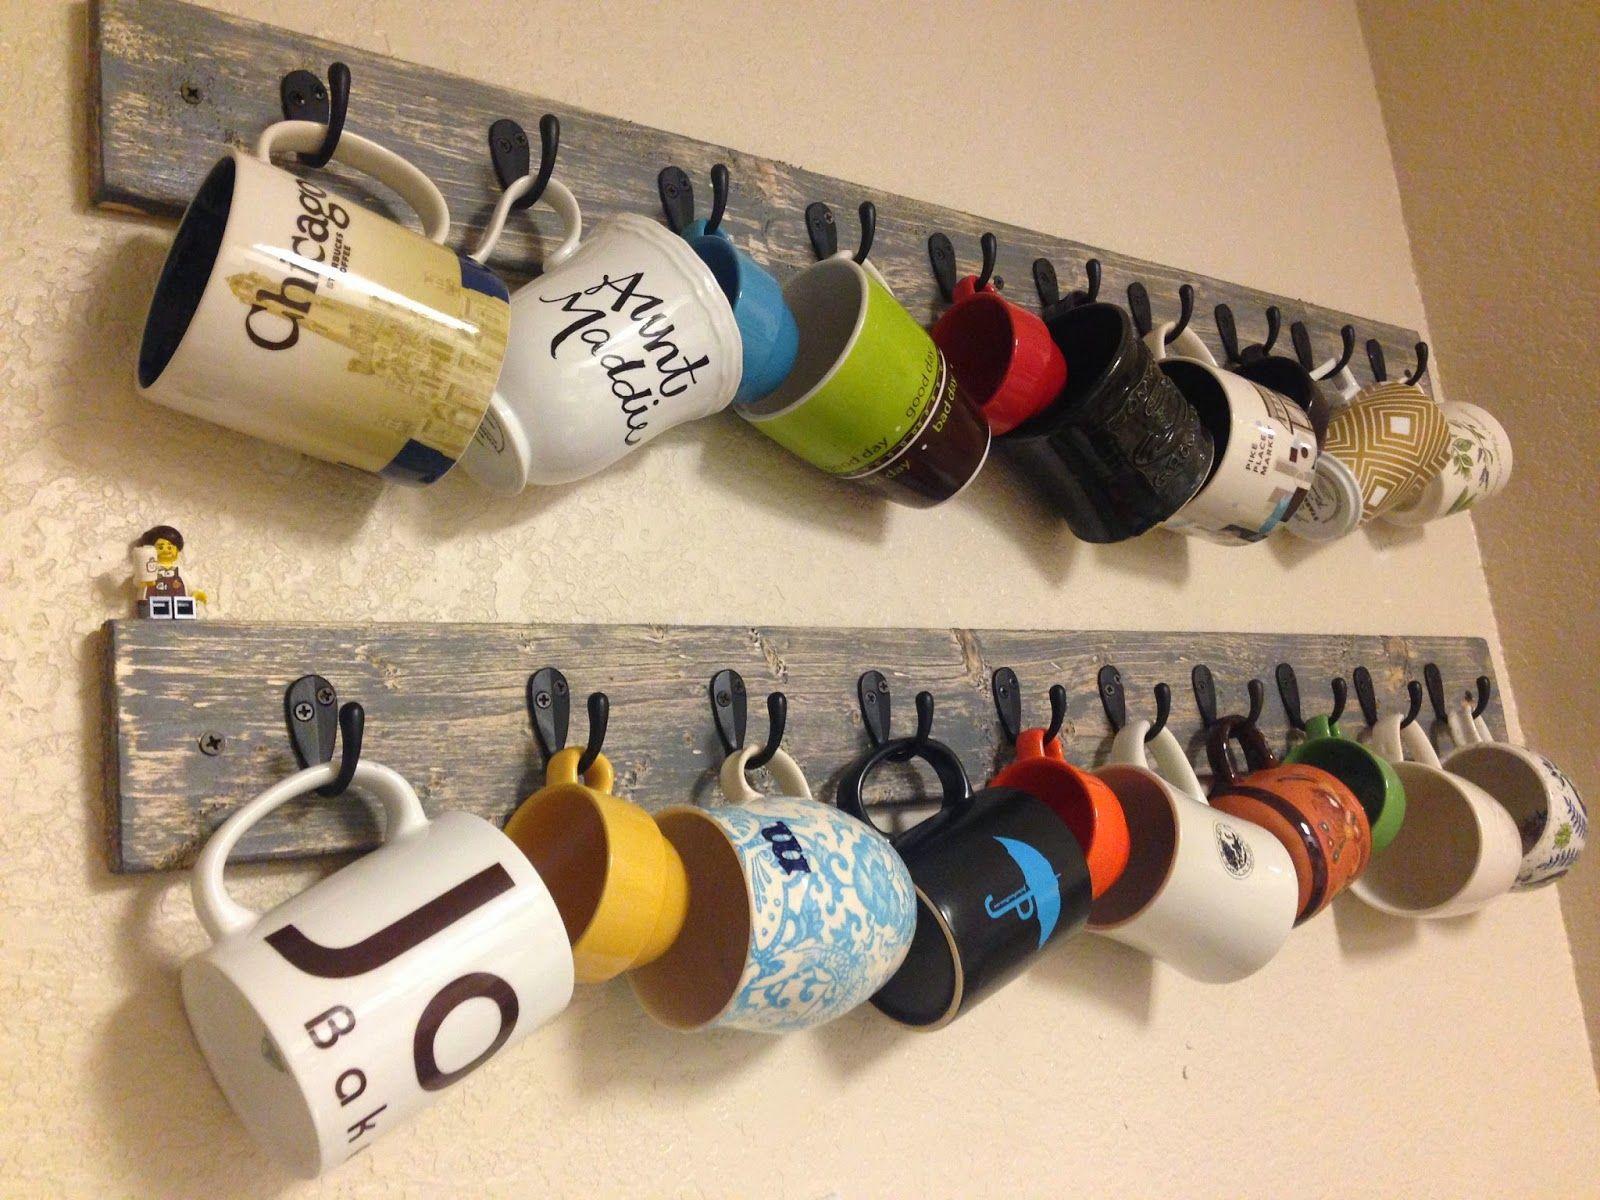 Coffee Mug Racks Apartment Kitchen Organization Home Diy Sweet